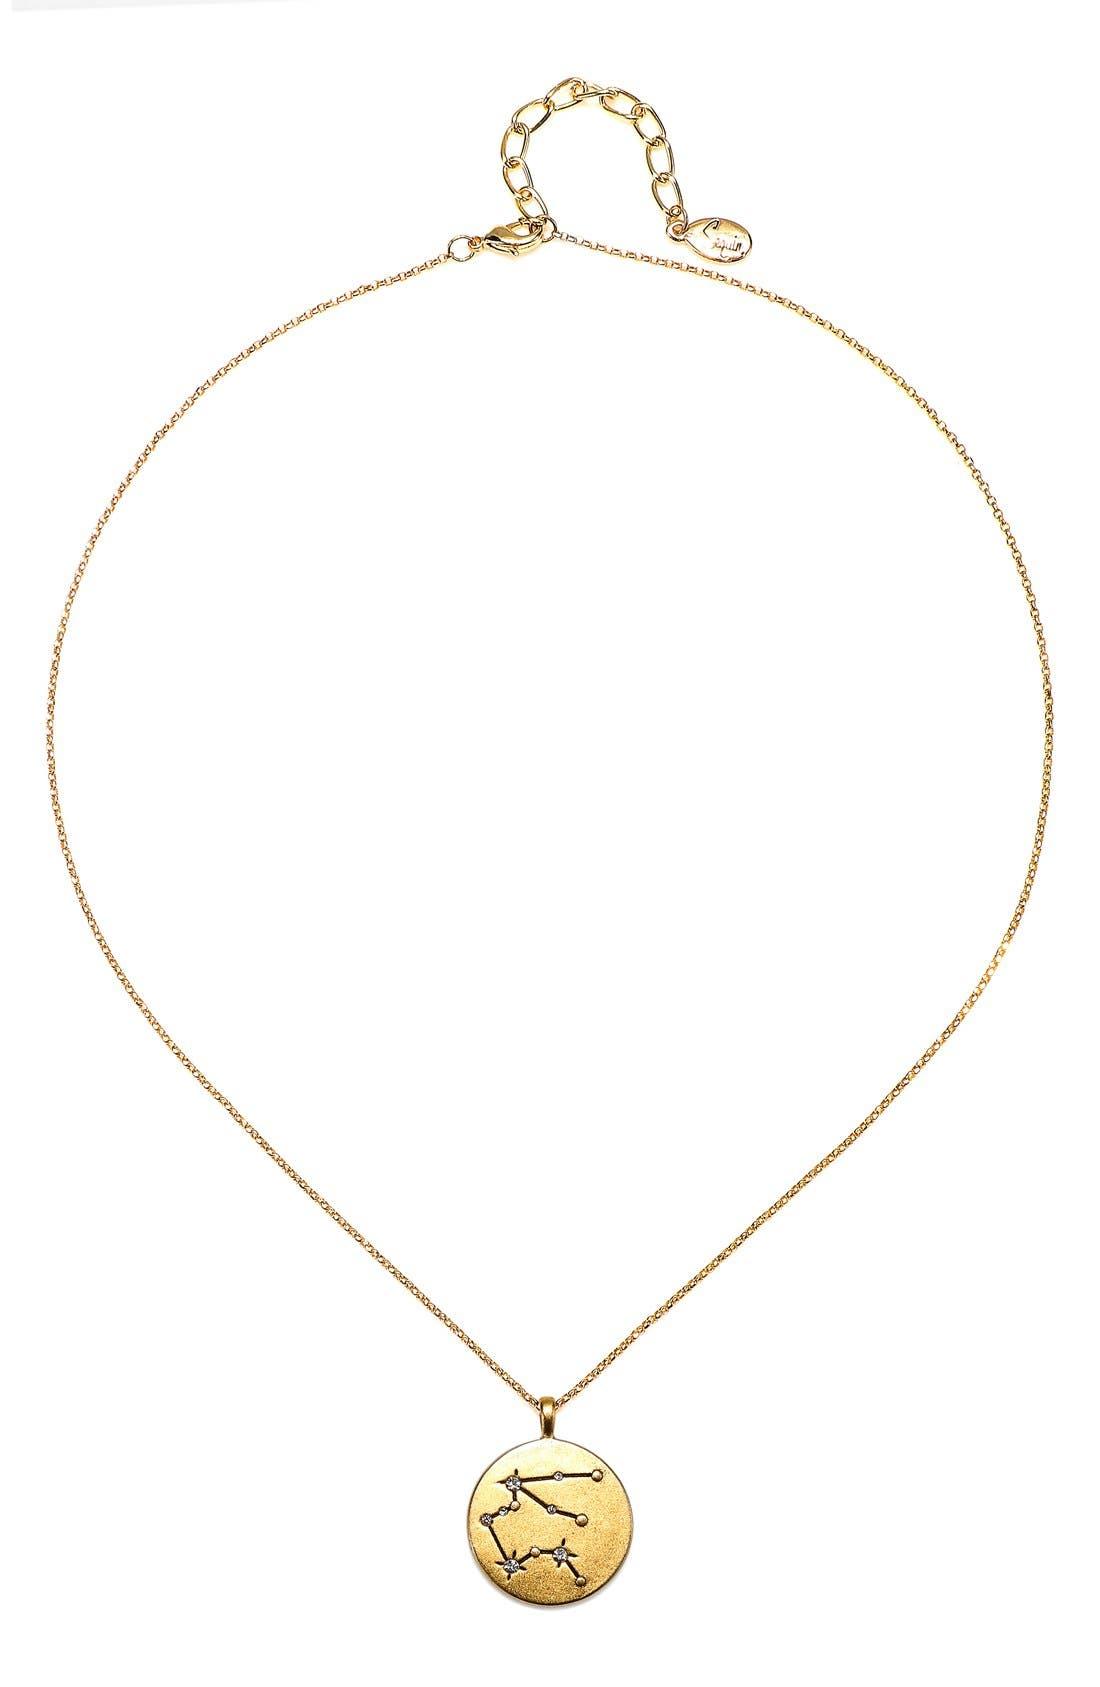 Sequin Celestial Pendant Necklace